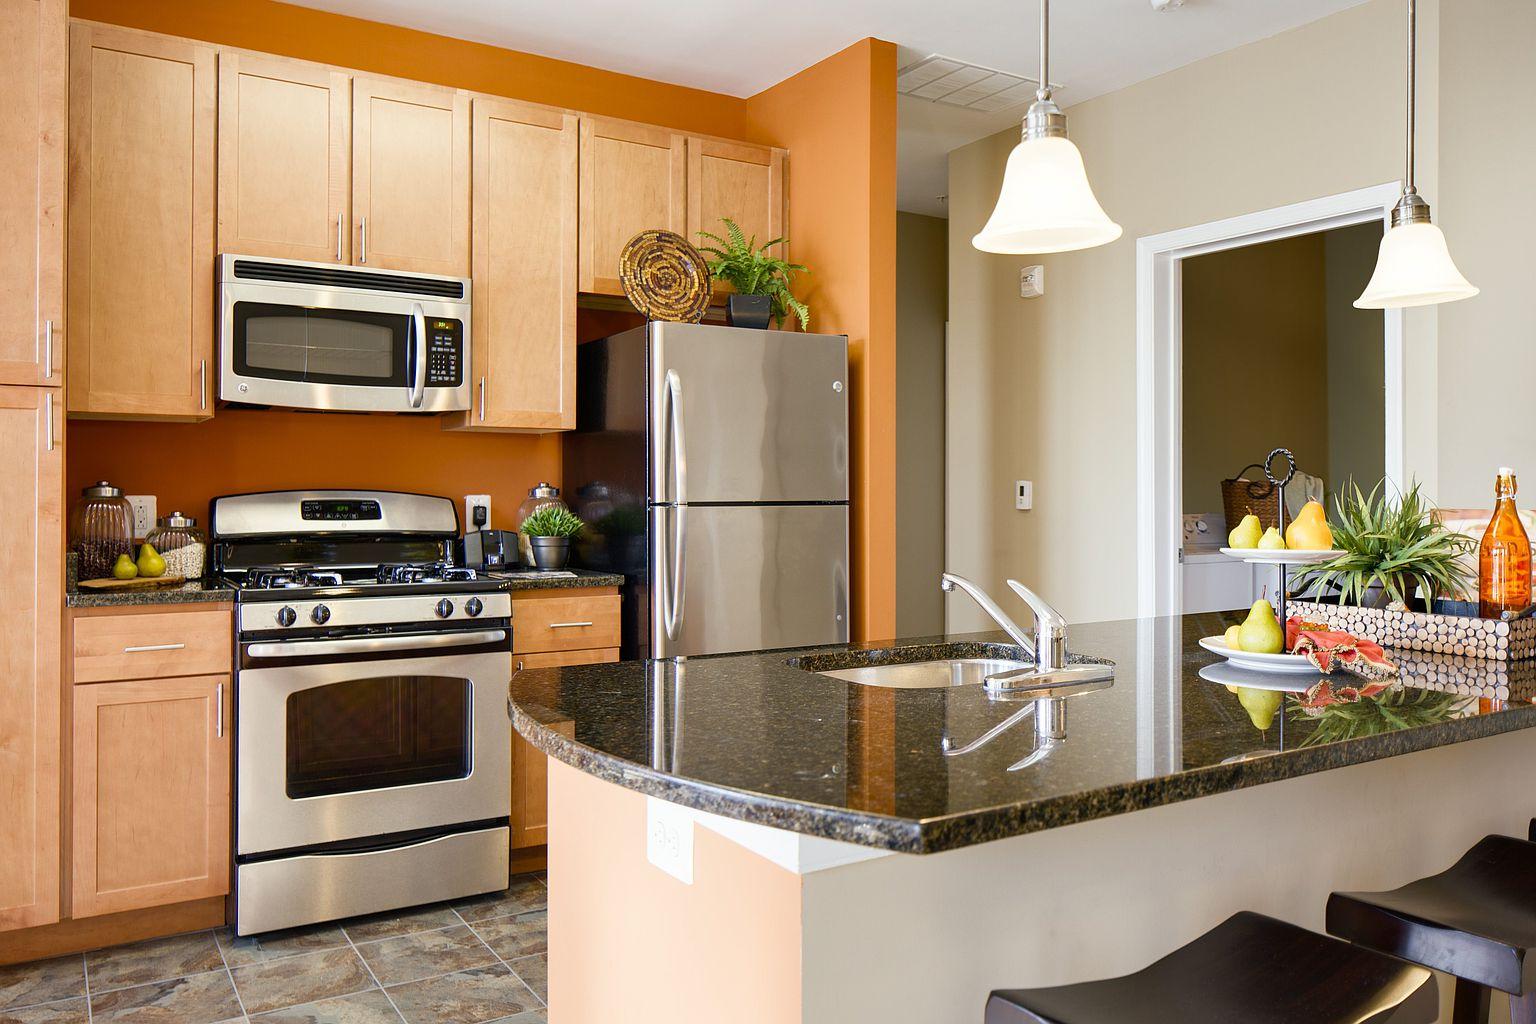 Enclave At Emerson Apartment Rentals Laurel Md Zillow